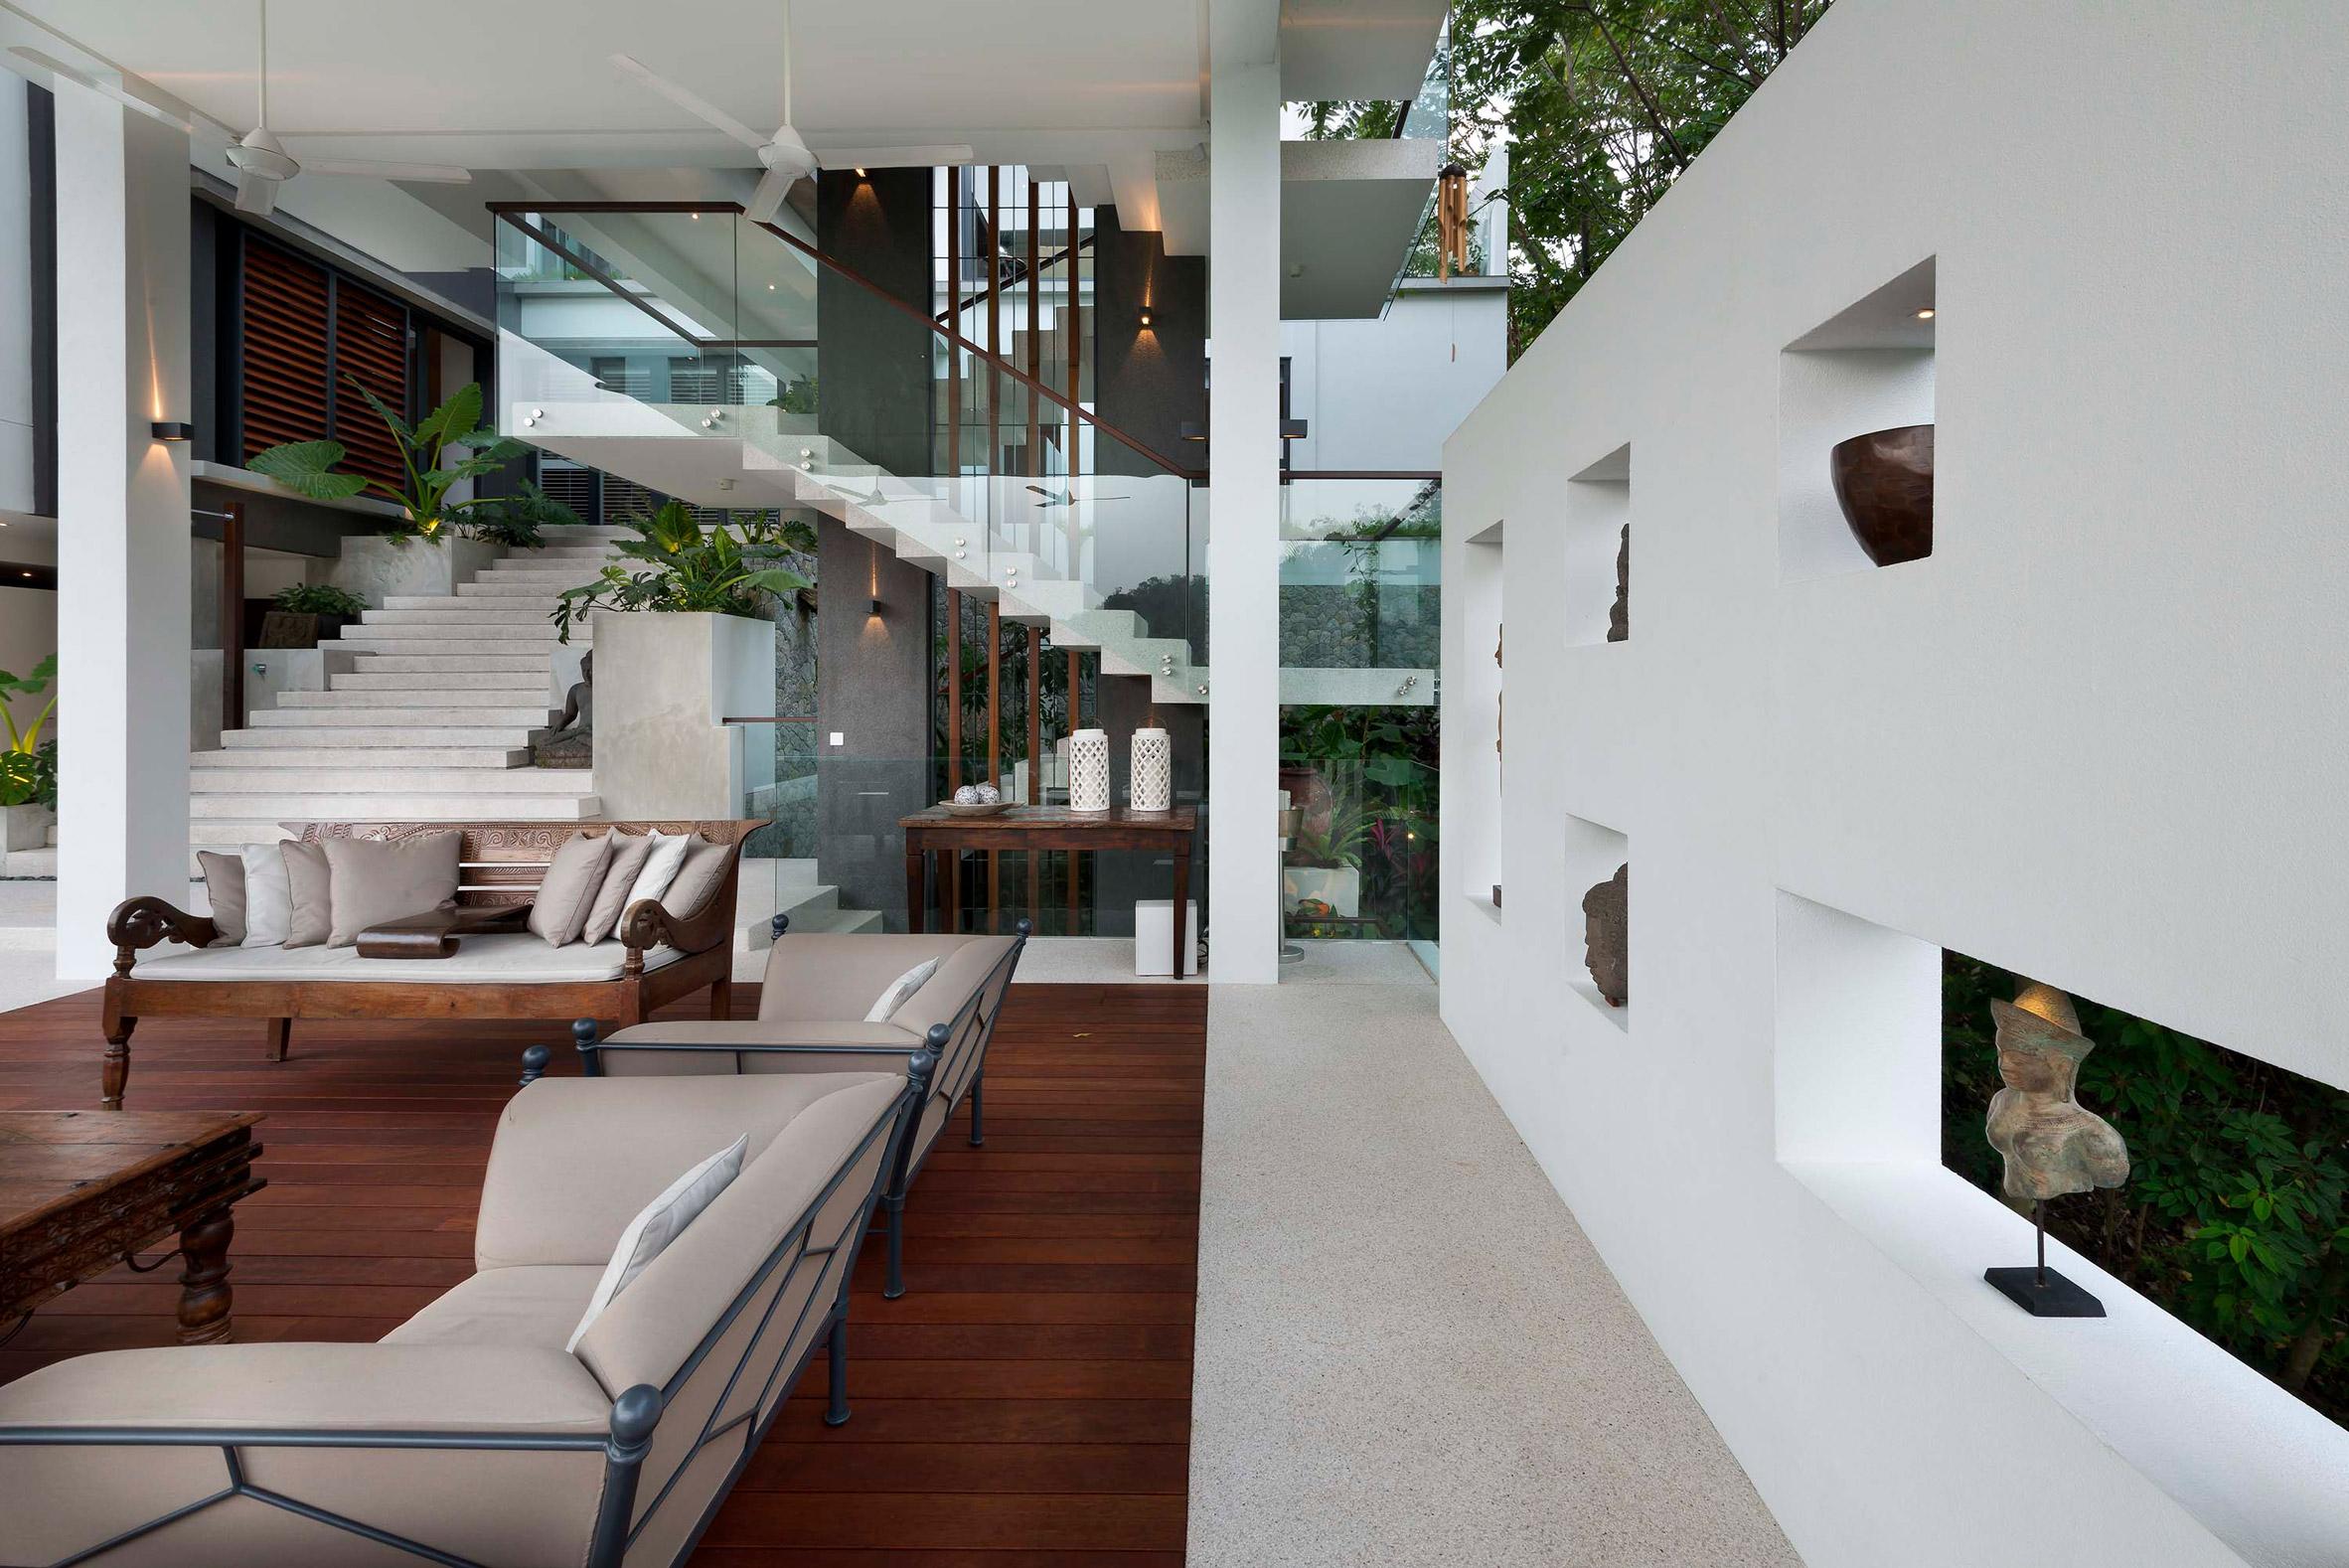 3novices crazy rich asians house represents region s changing taste says architect 3noviceseurope. Black Bedroom Furniture Sets. Home Design Ideas